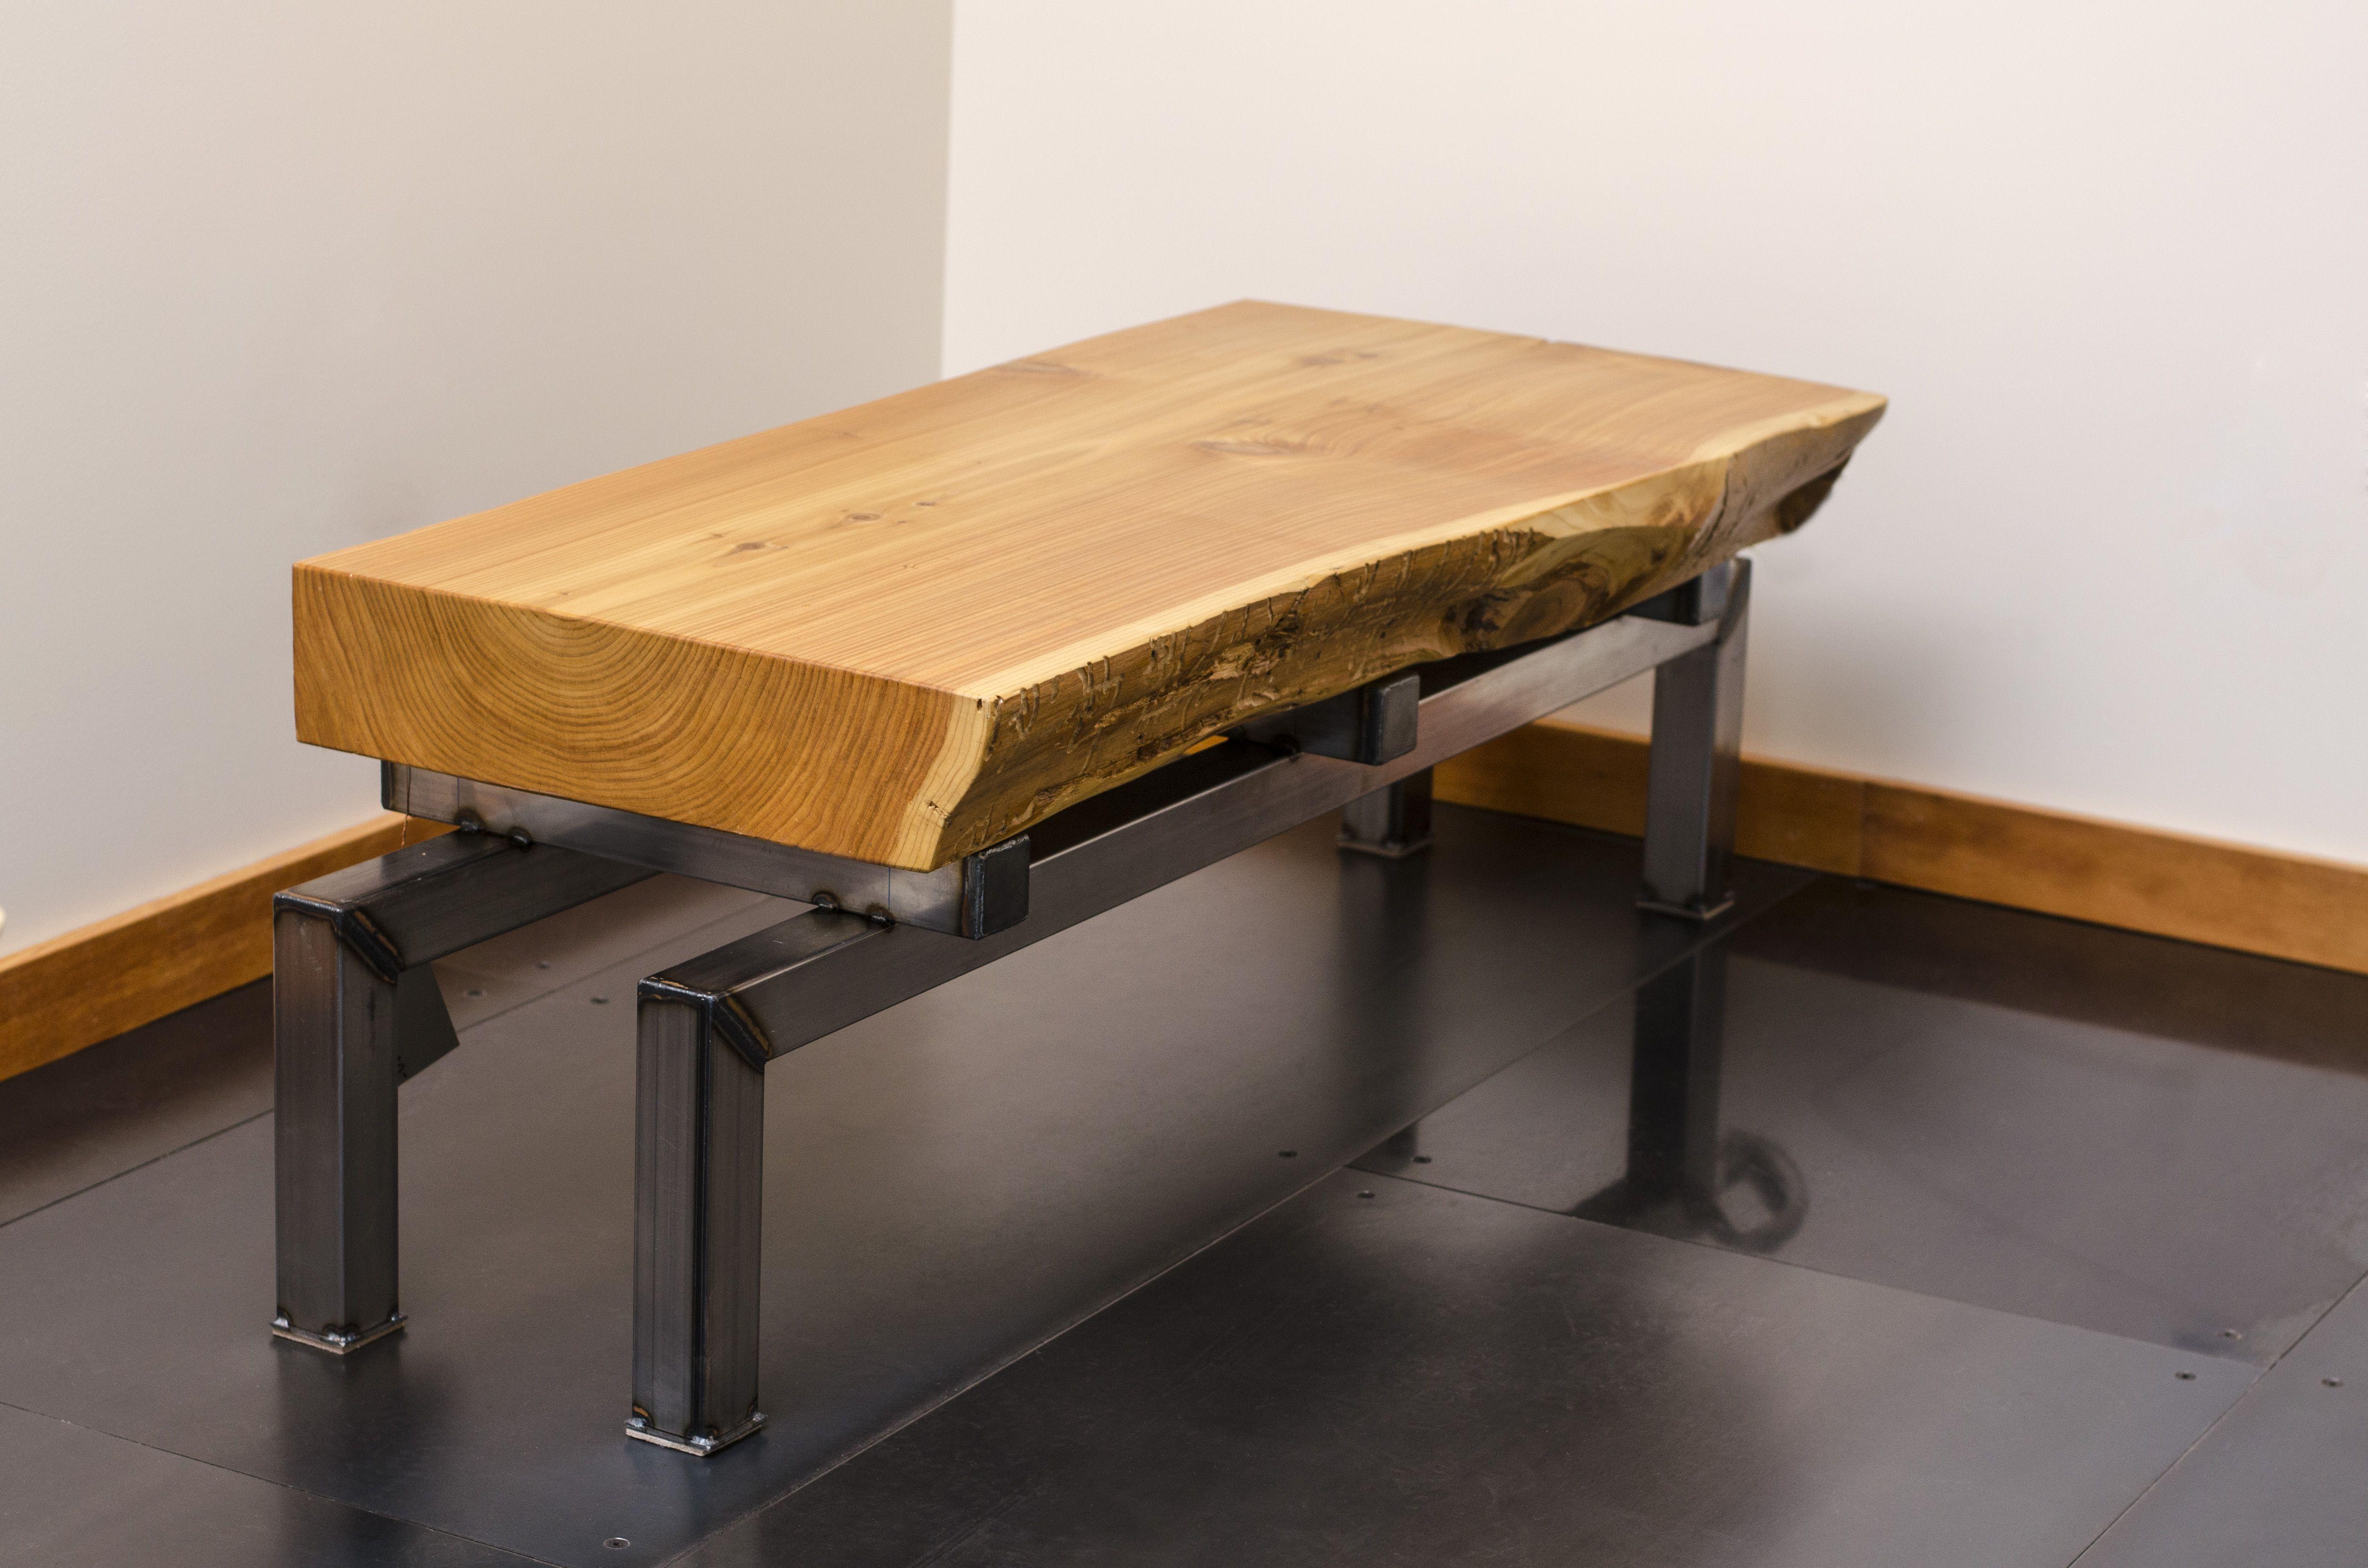 steel chair in slab hammock indoor buy a hand crafted live edge cedar coffee table on